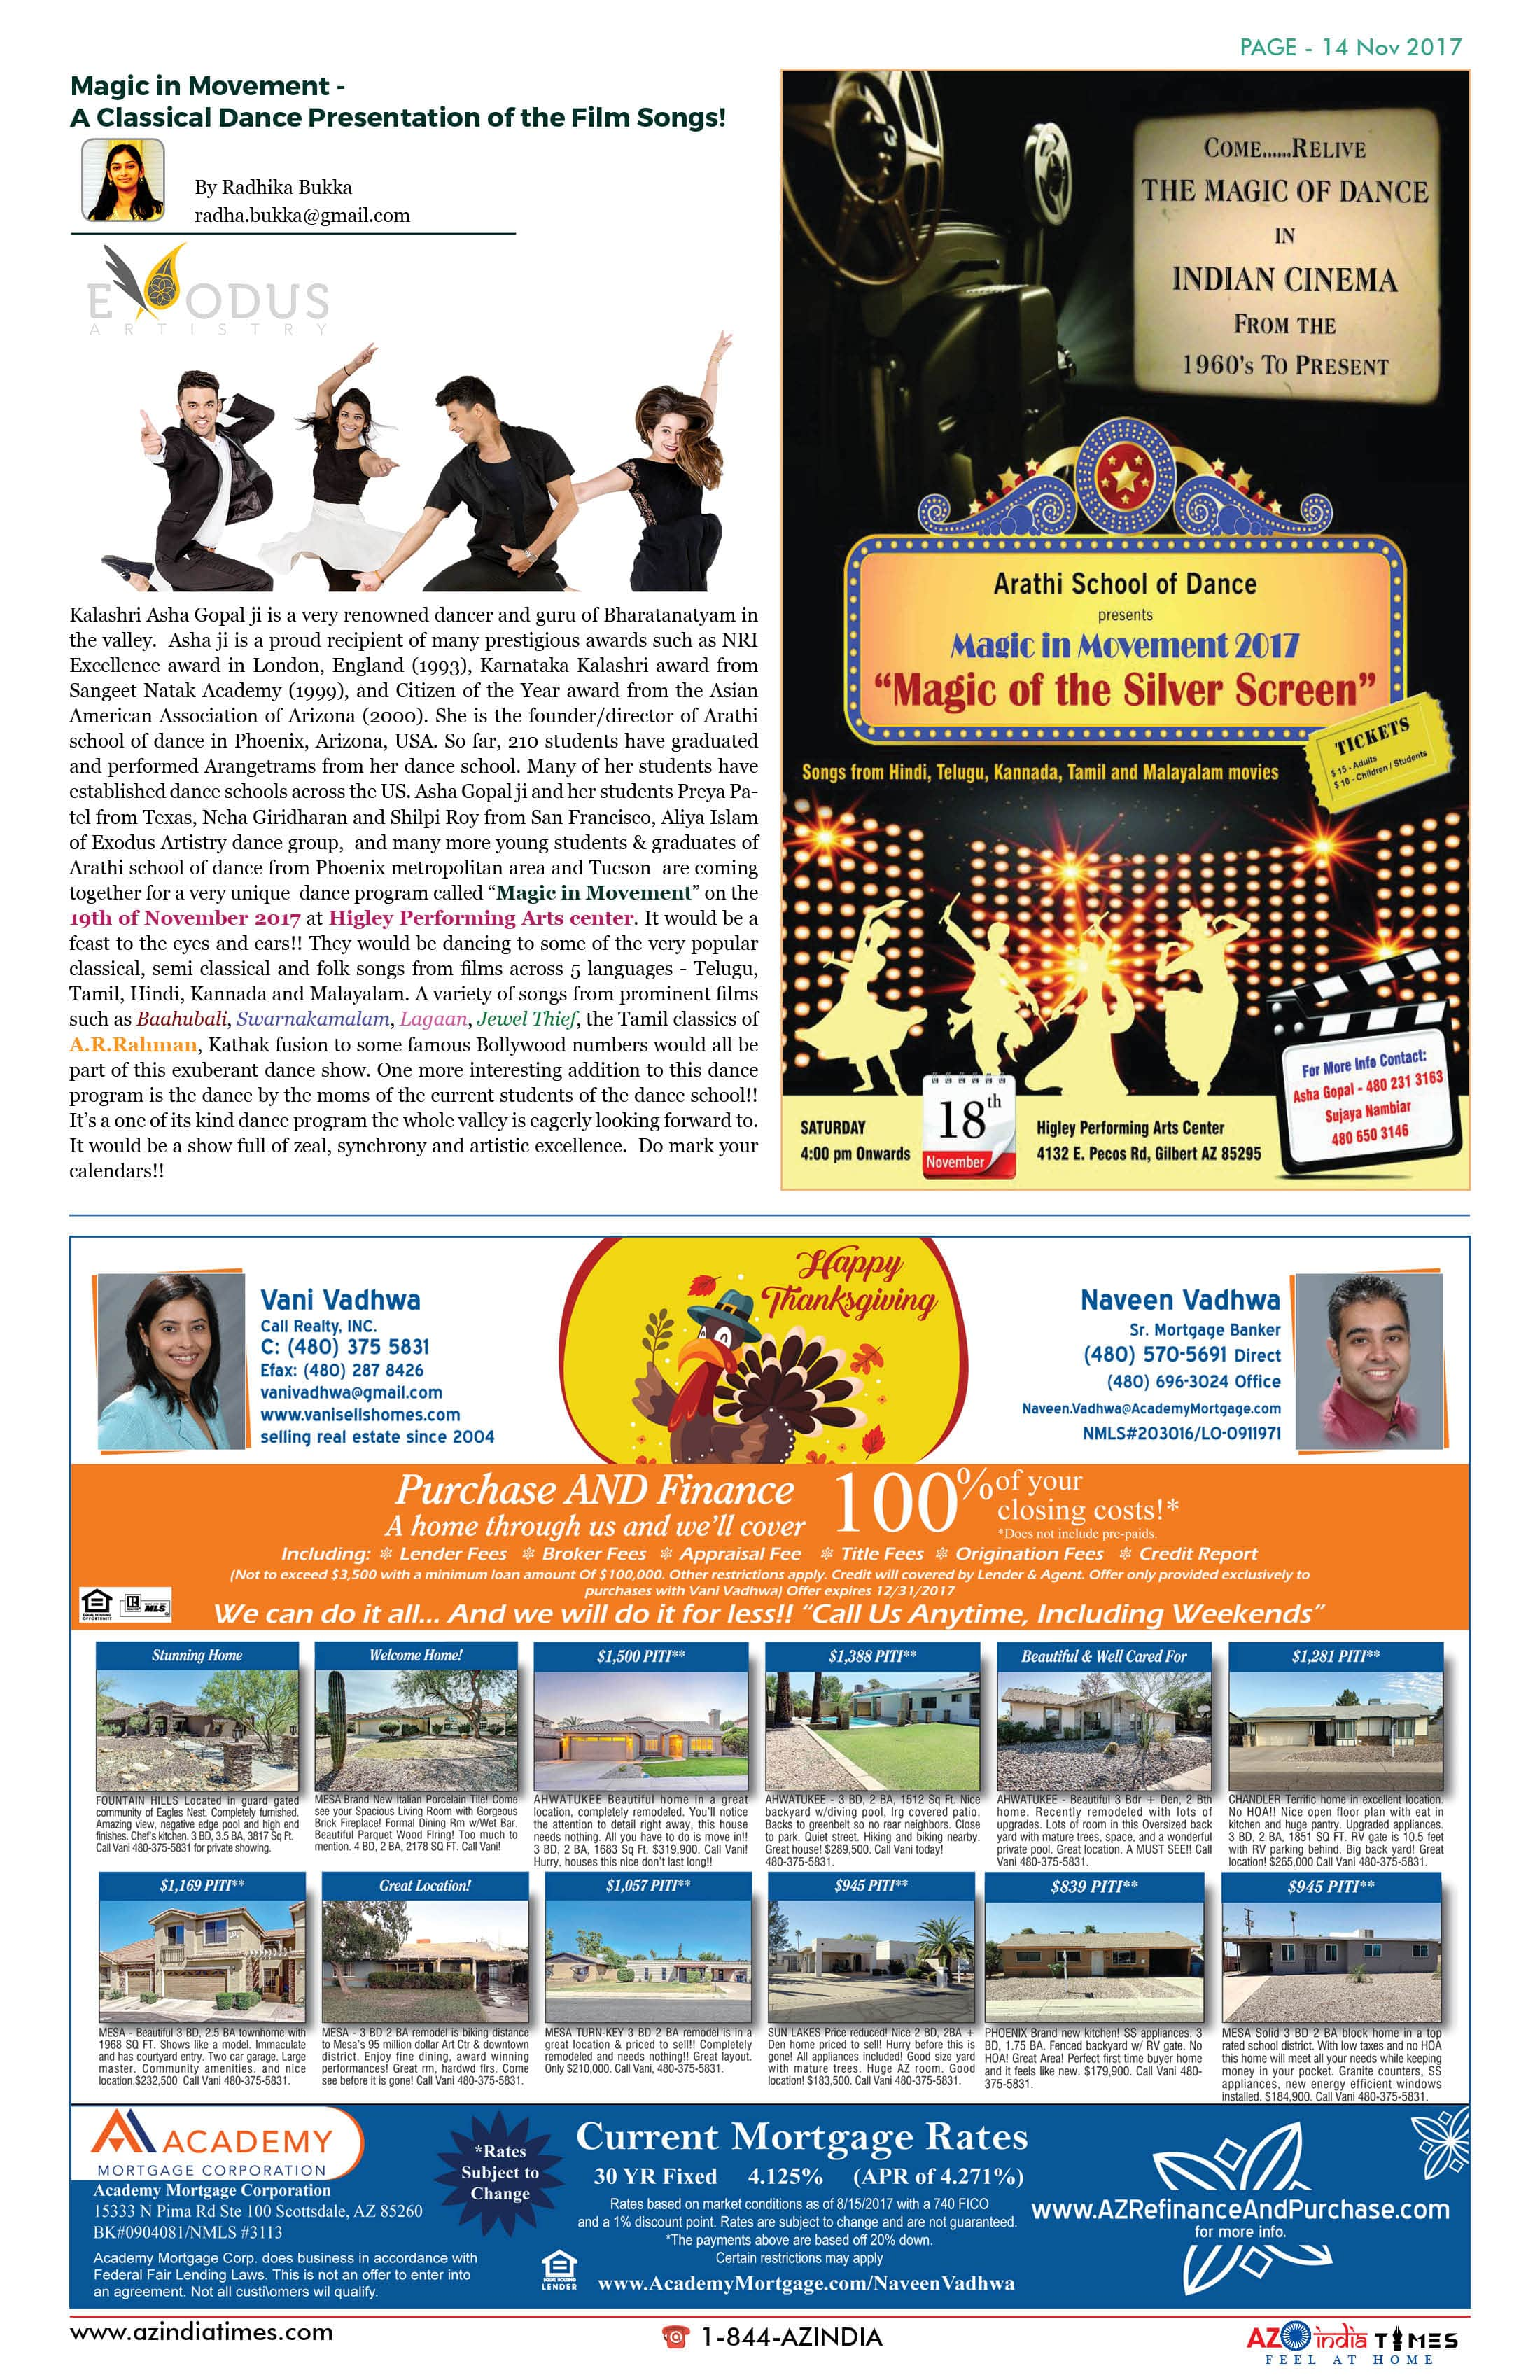 AZ INDIA TIMES NOVEMBER EDITION14